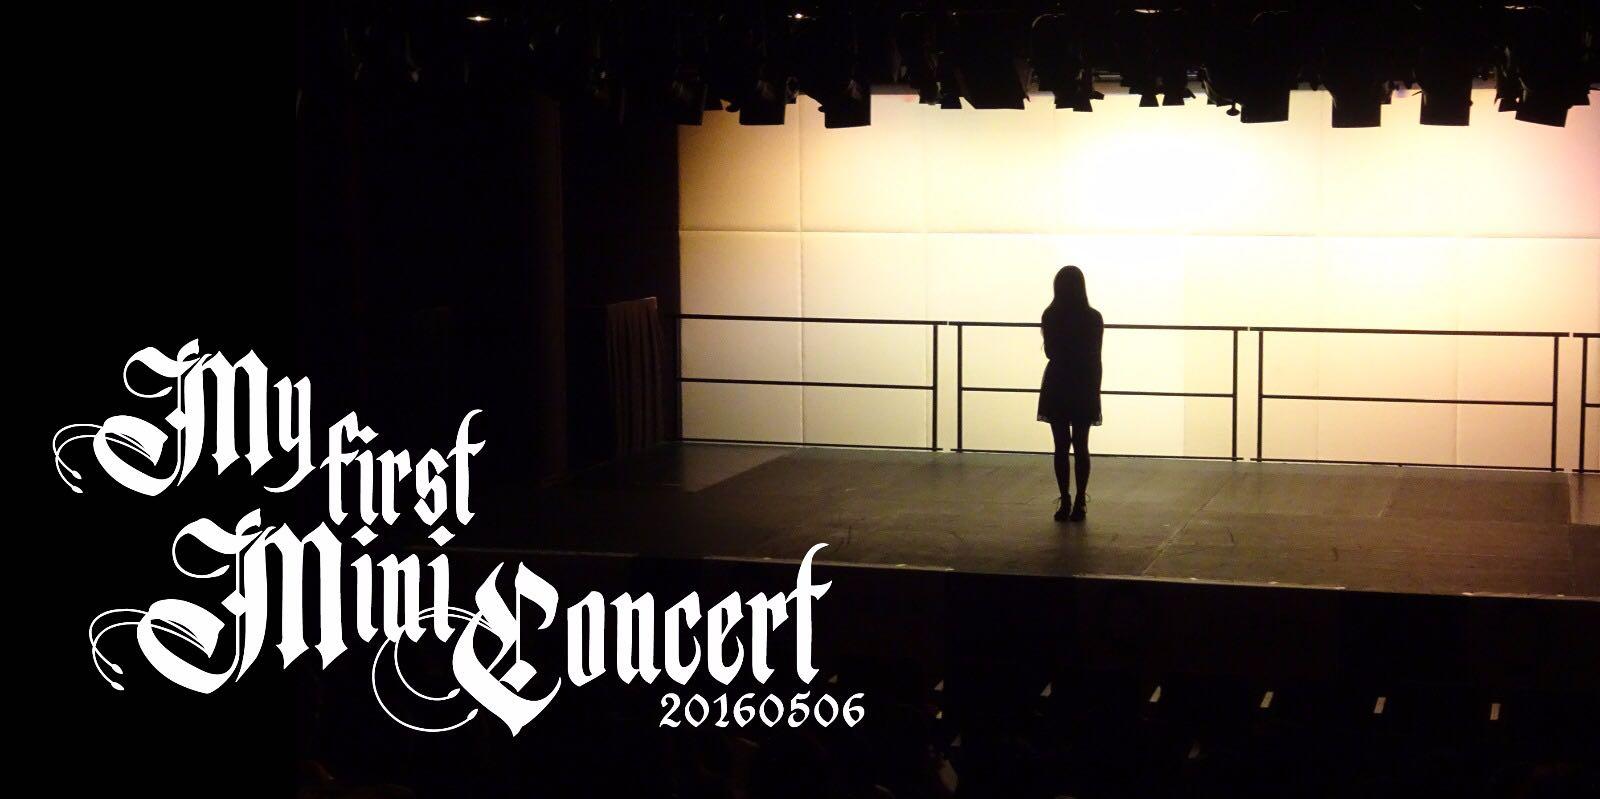 Student Concert - Kristy